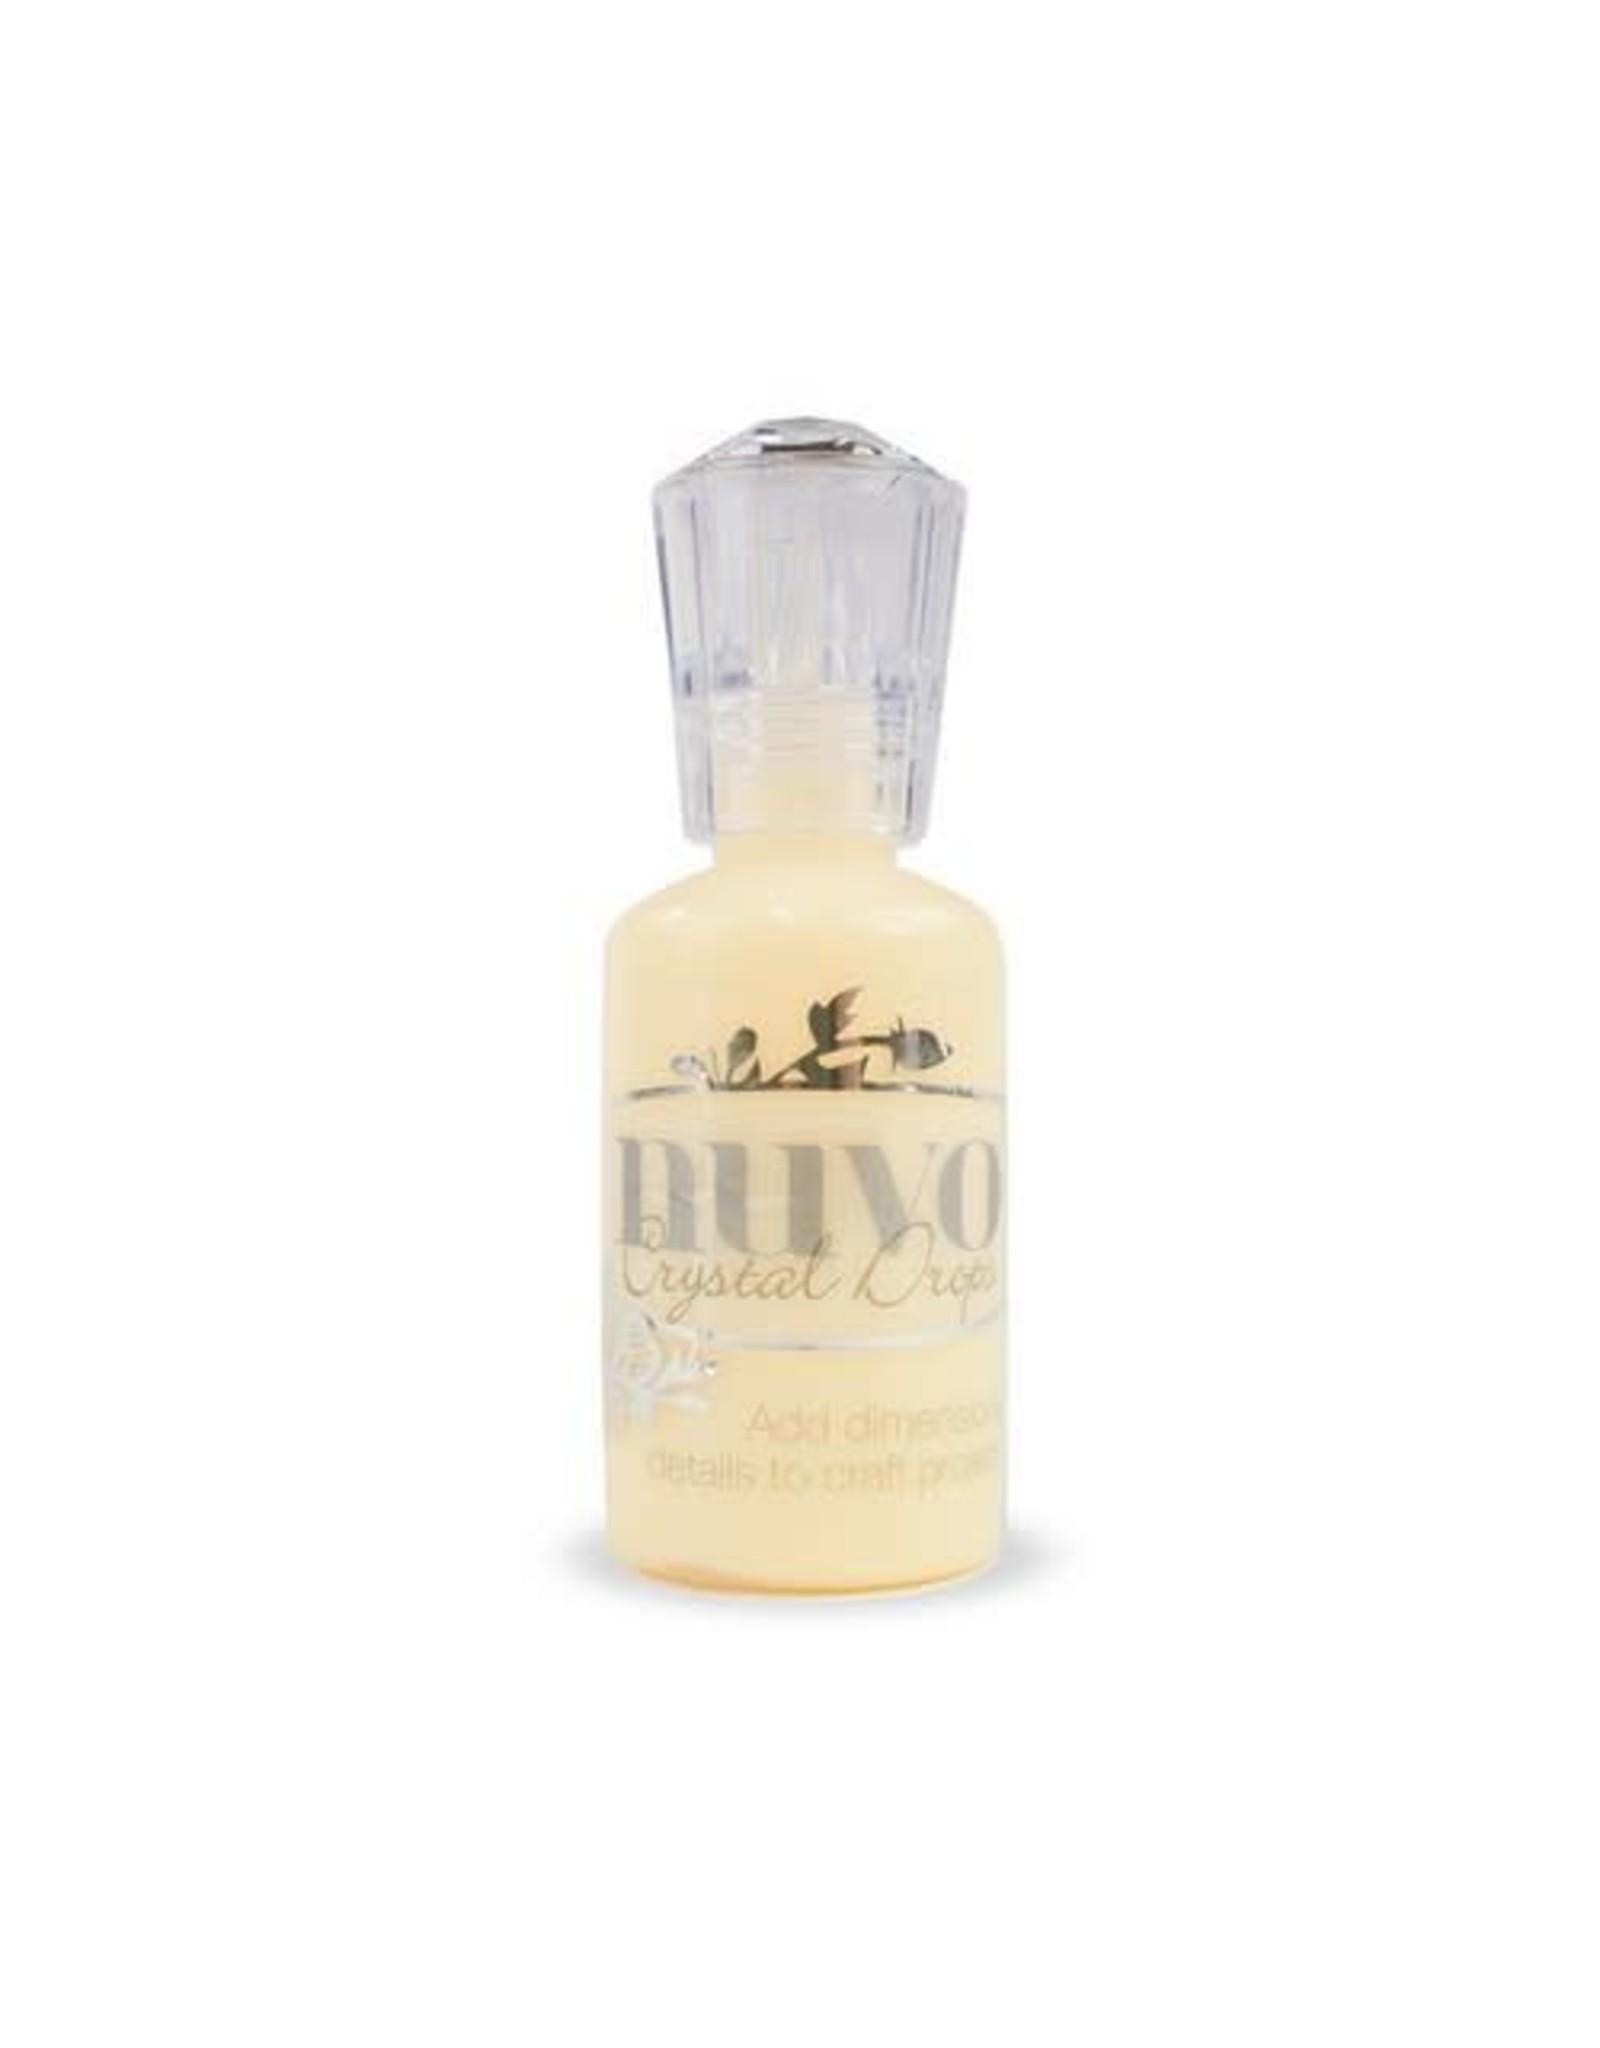 Nuvo crystal drops Nuvo crystal drops - buttermilk  652N